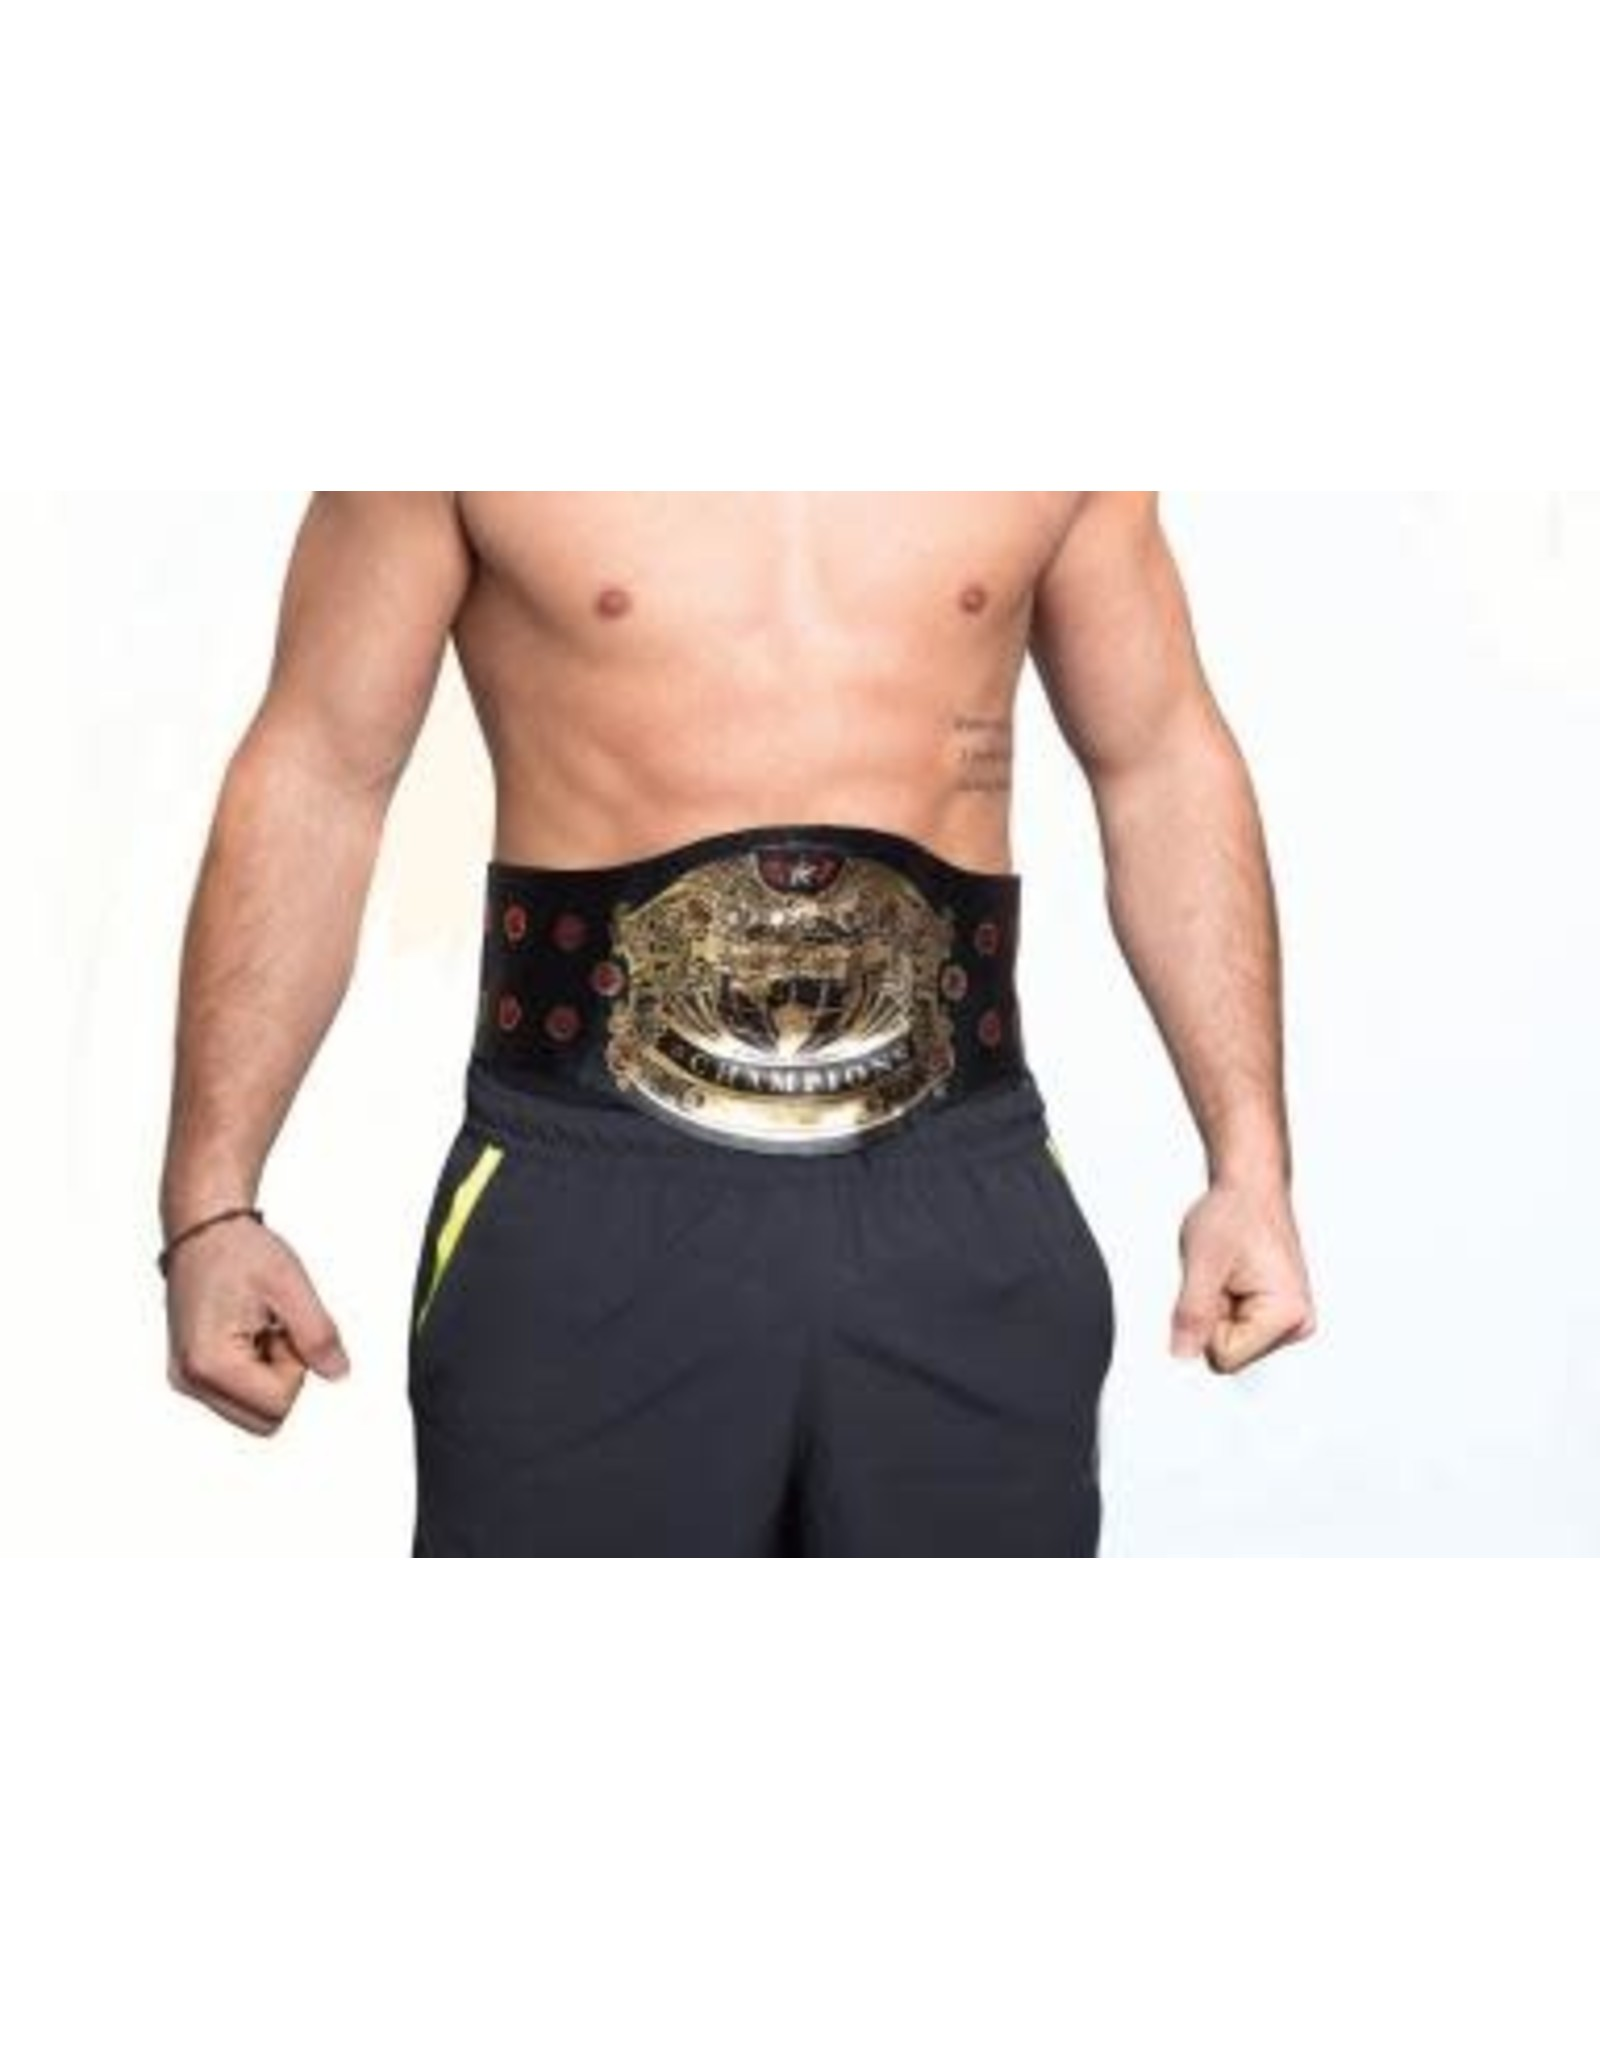 HM Smallwares Champion Wrestling Belt